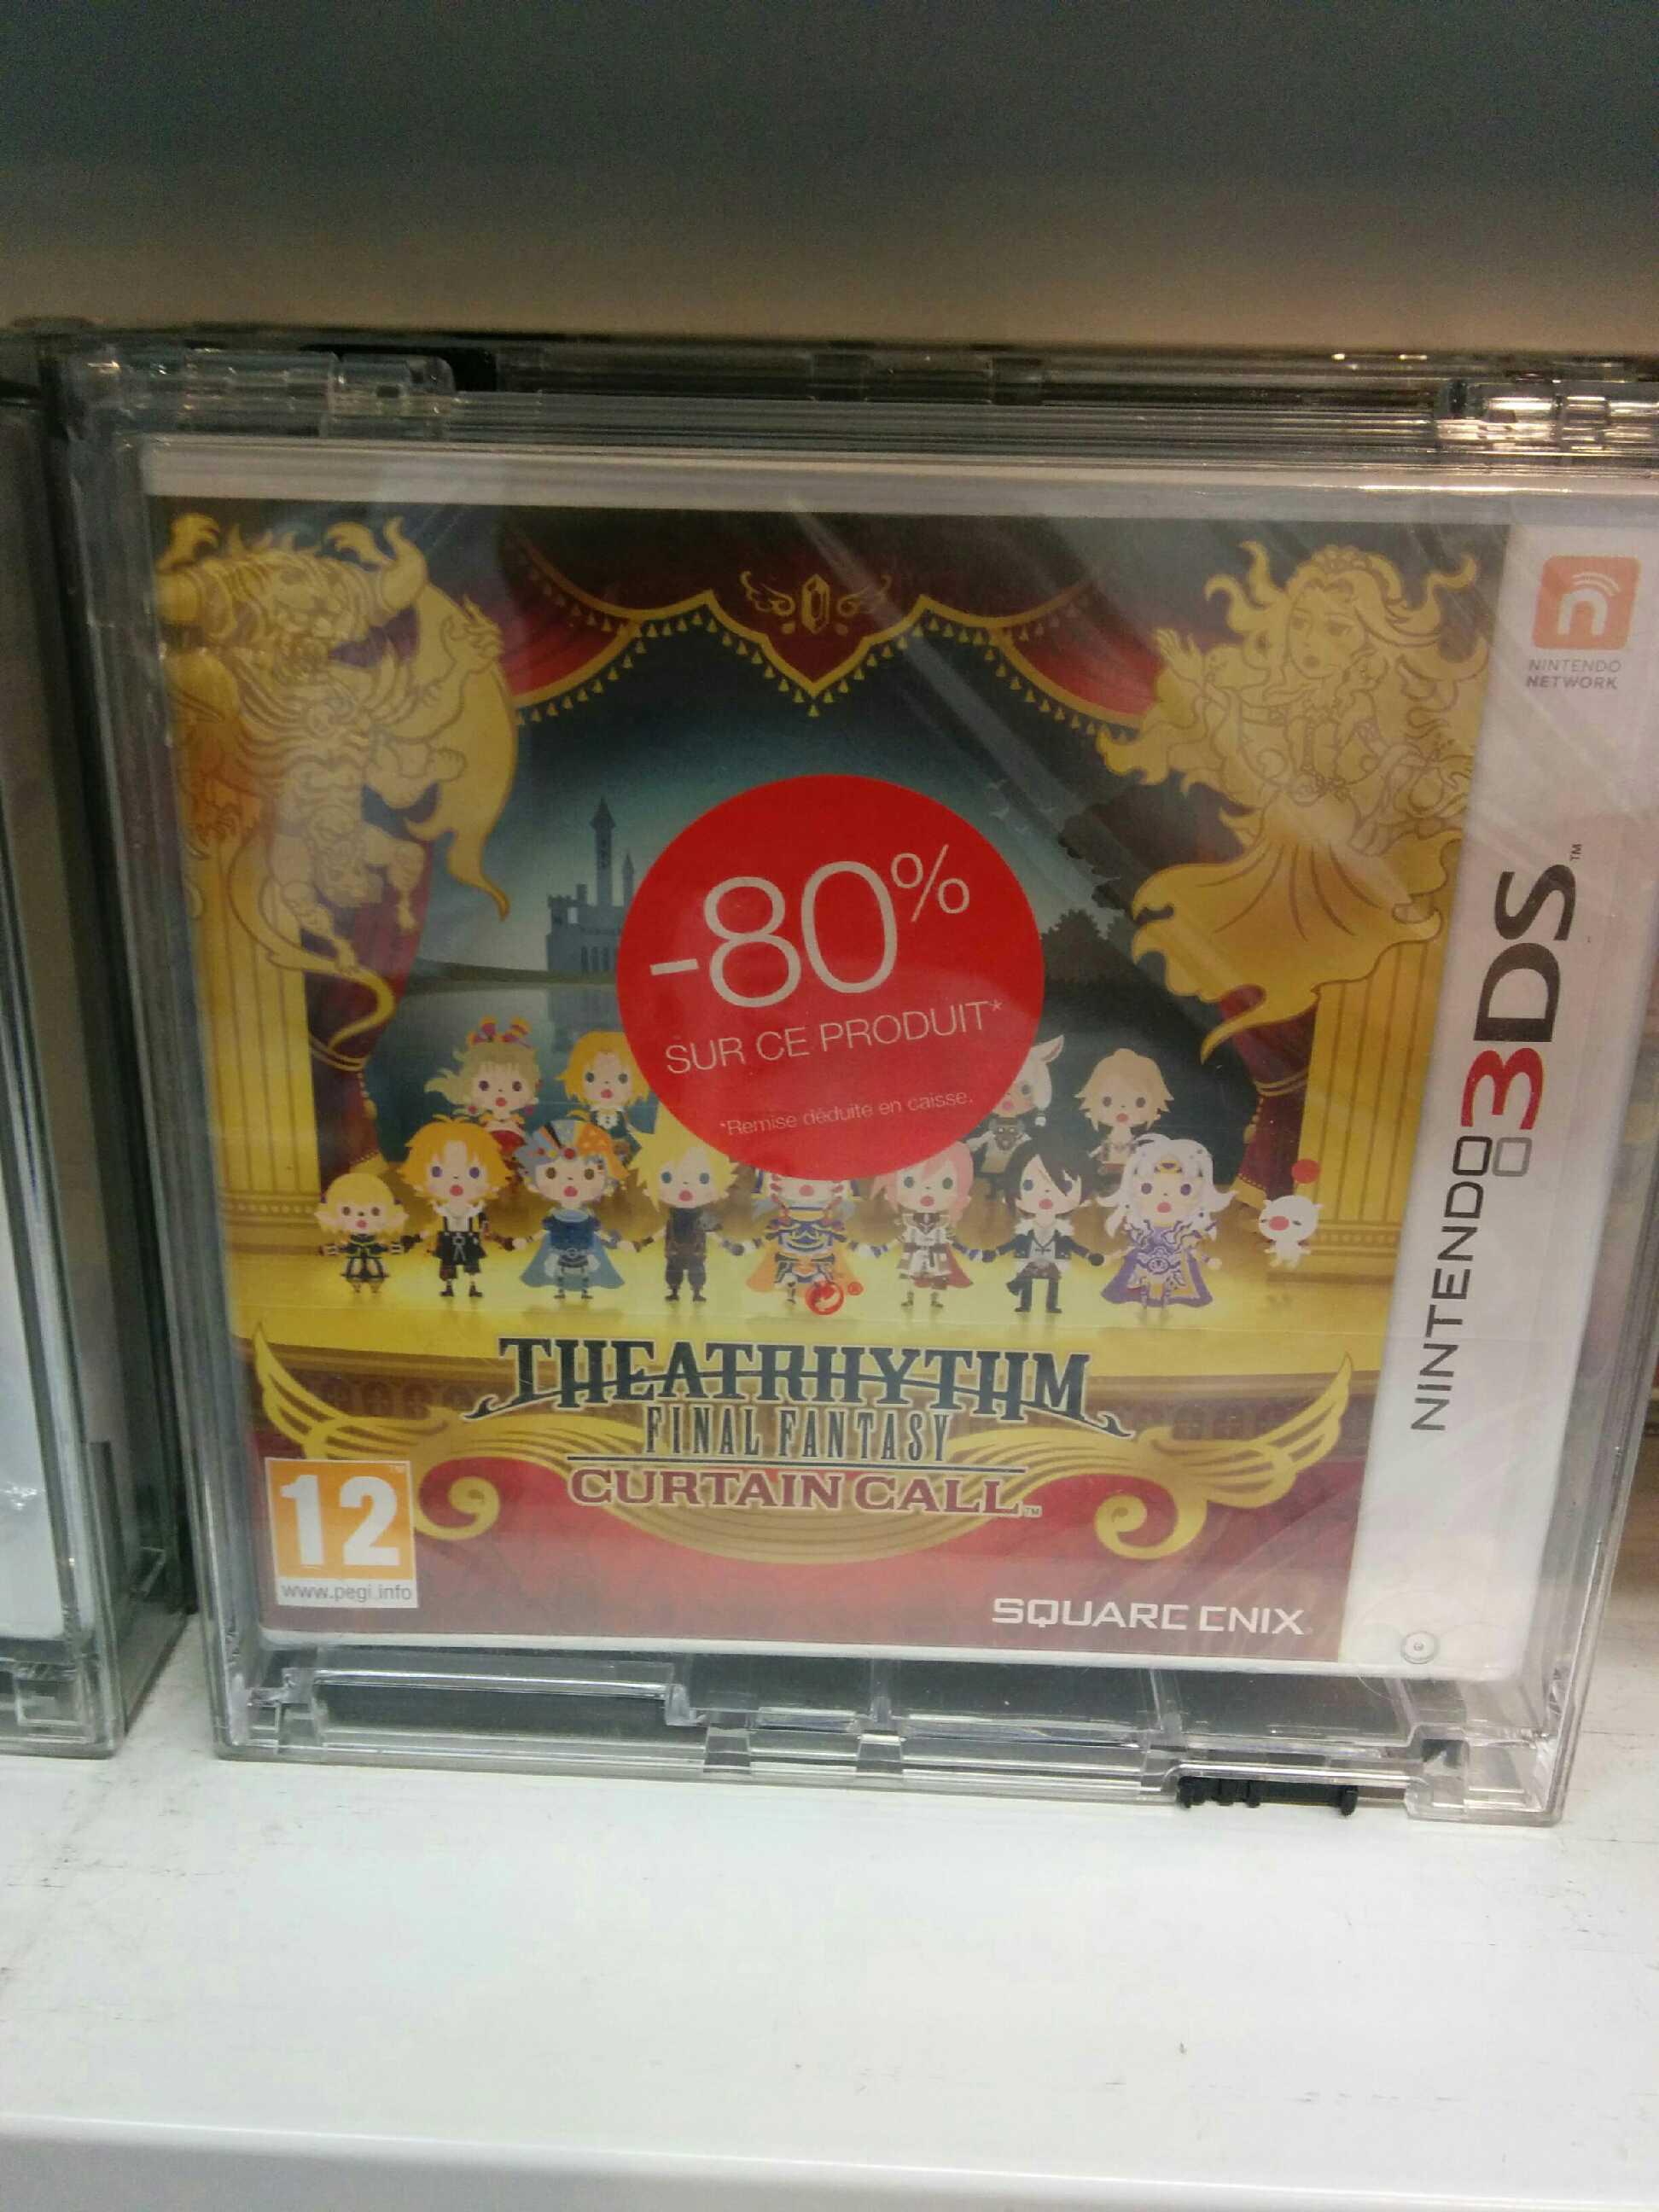 Jeu Theatrhythm Final Fantasy Curtain Call sur 3DS